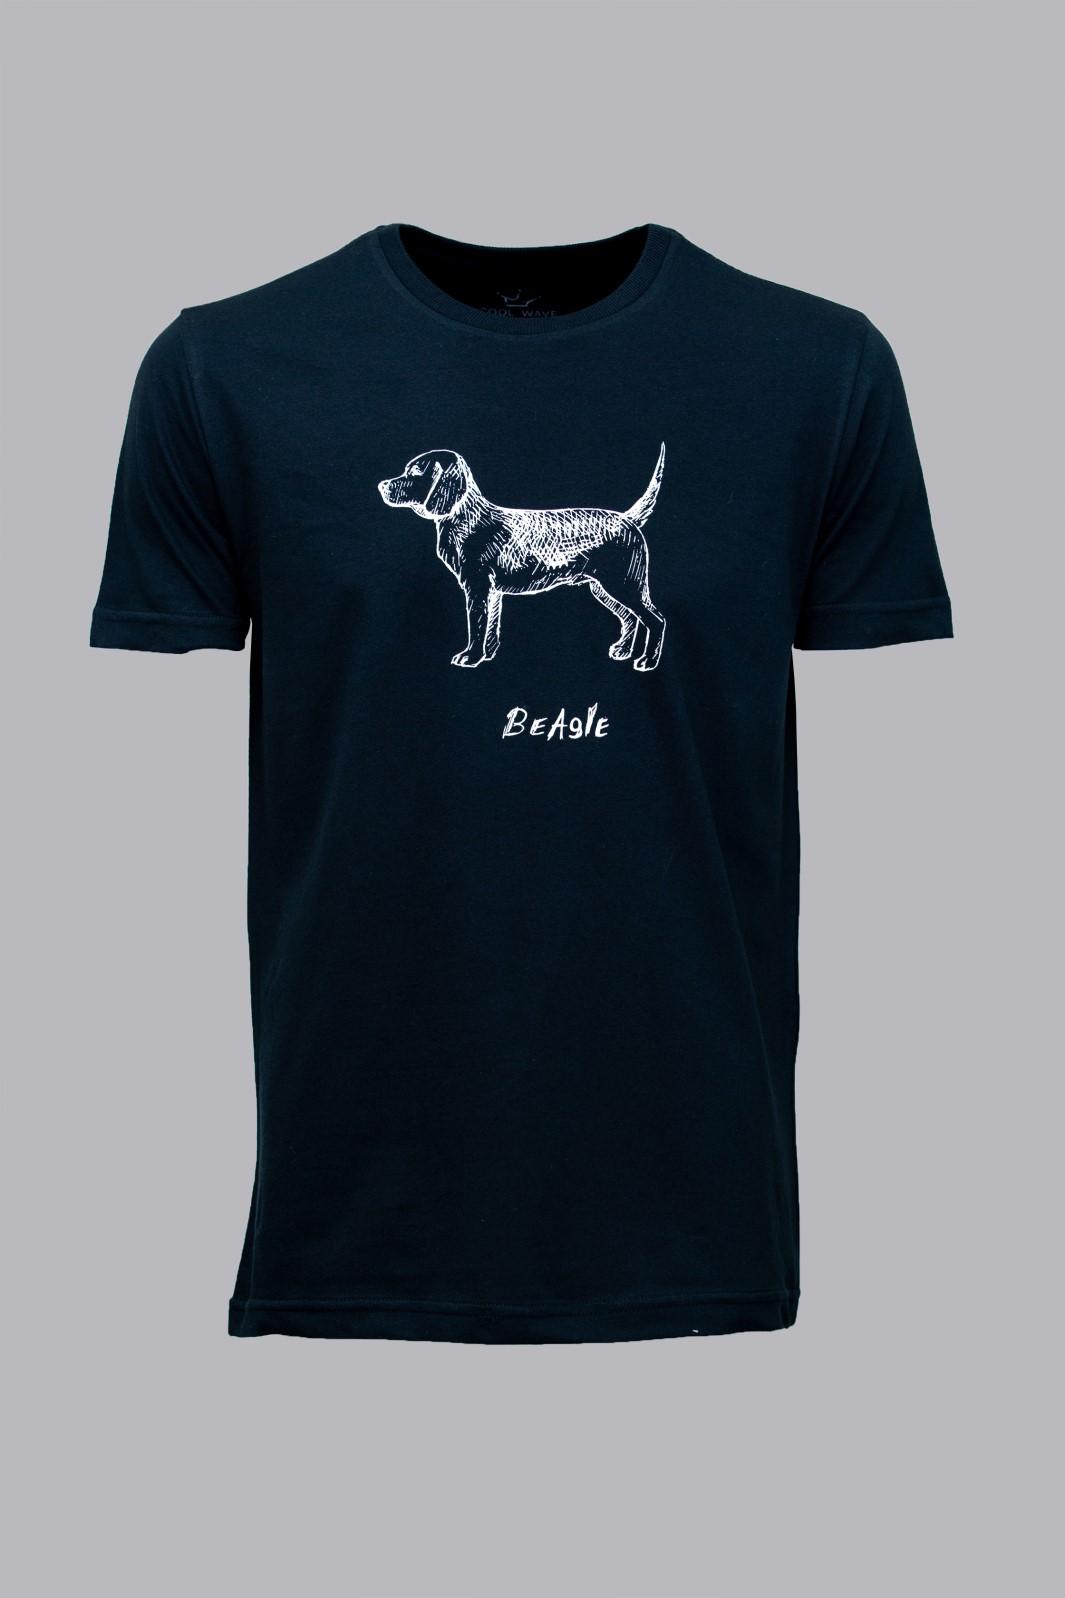 Camiseta CoolWave Beagle